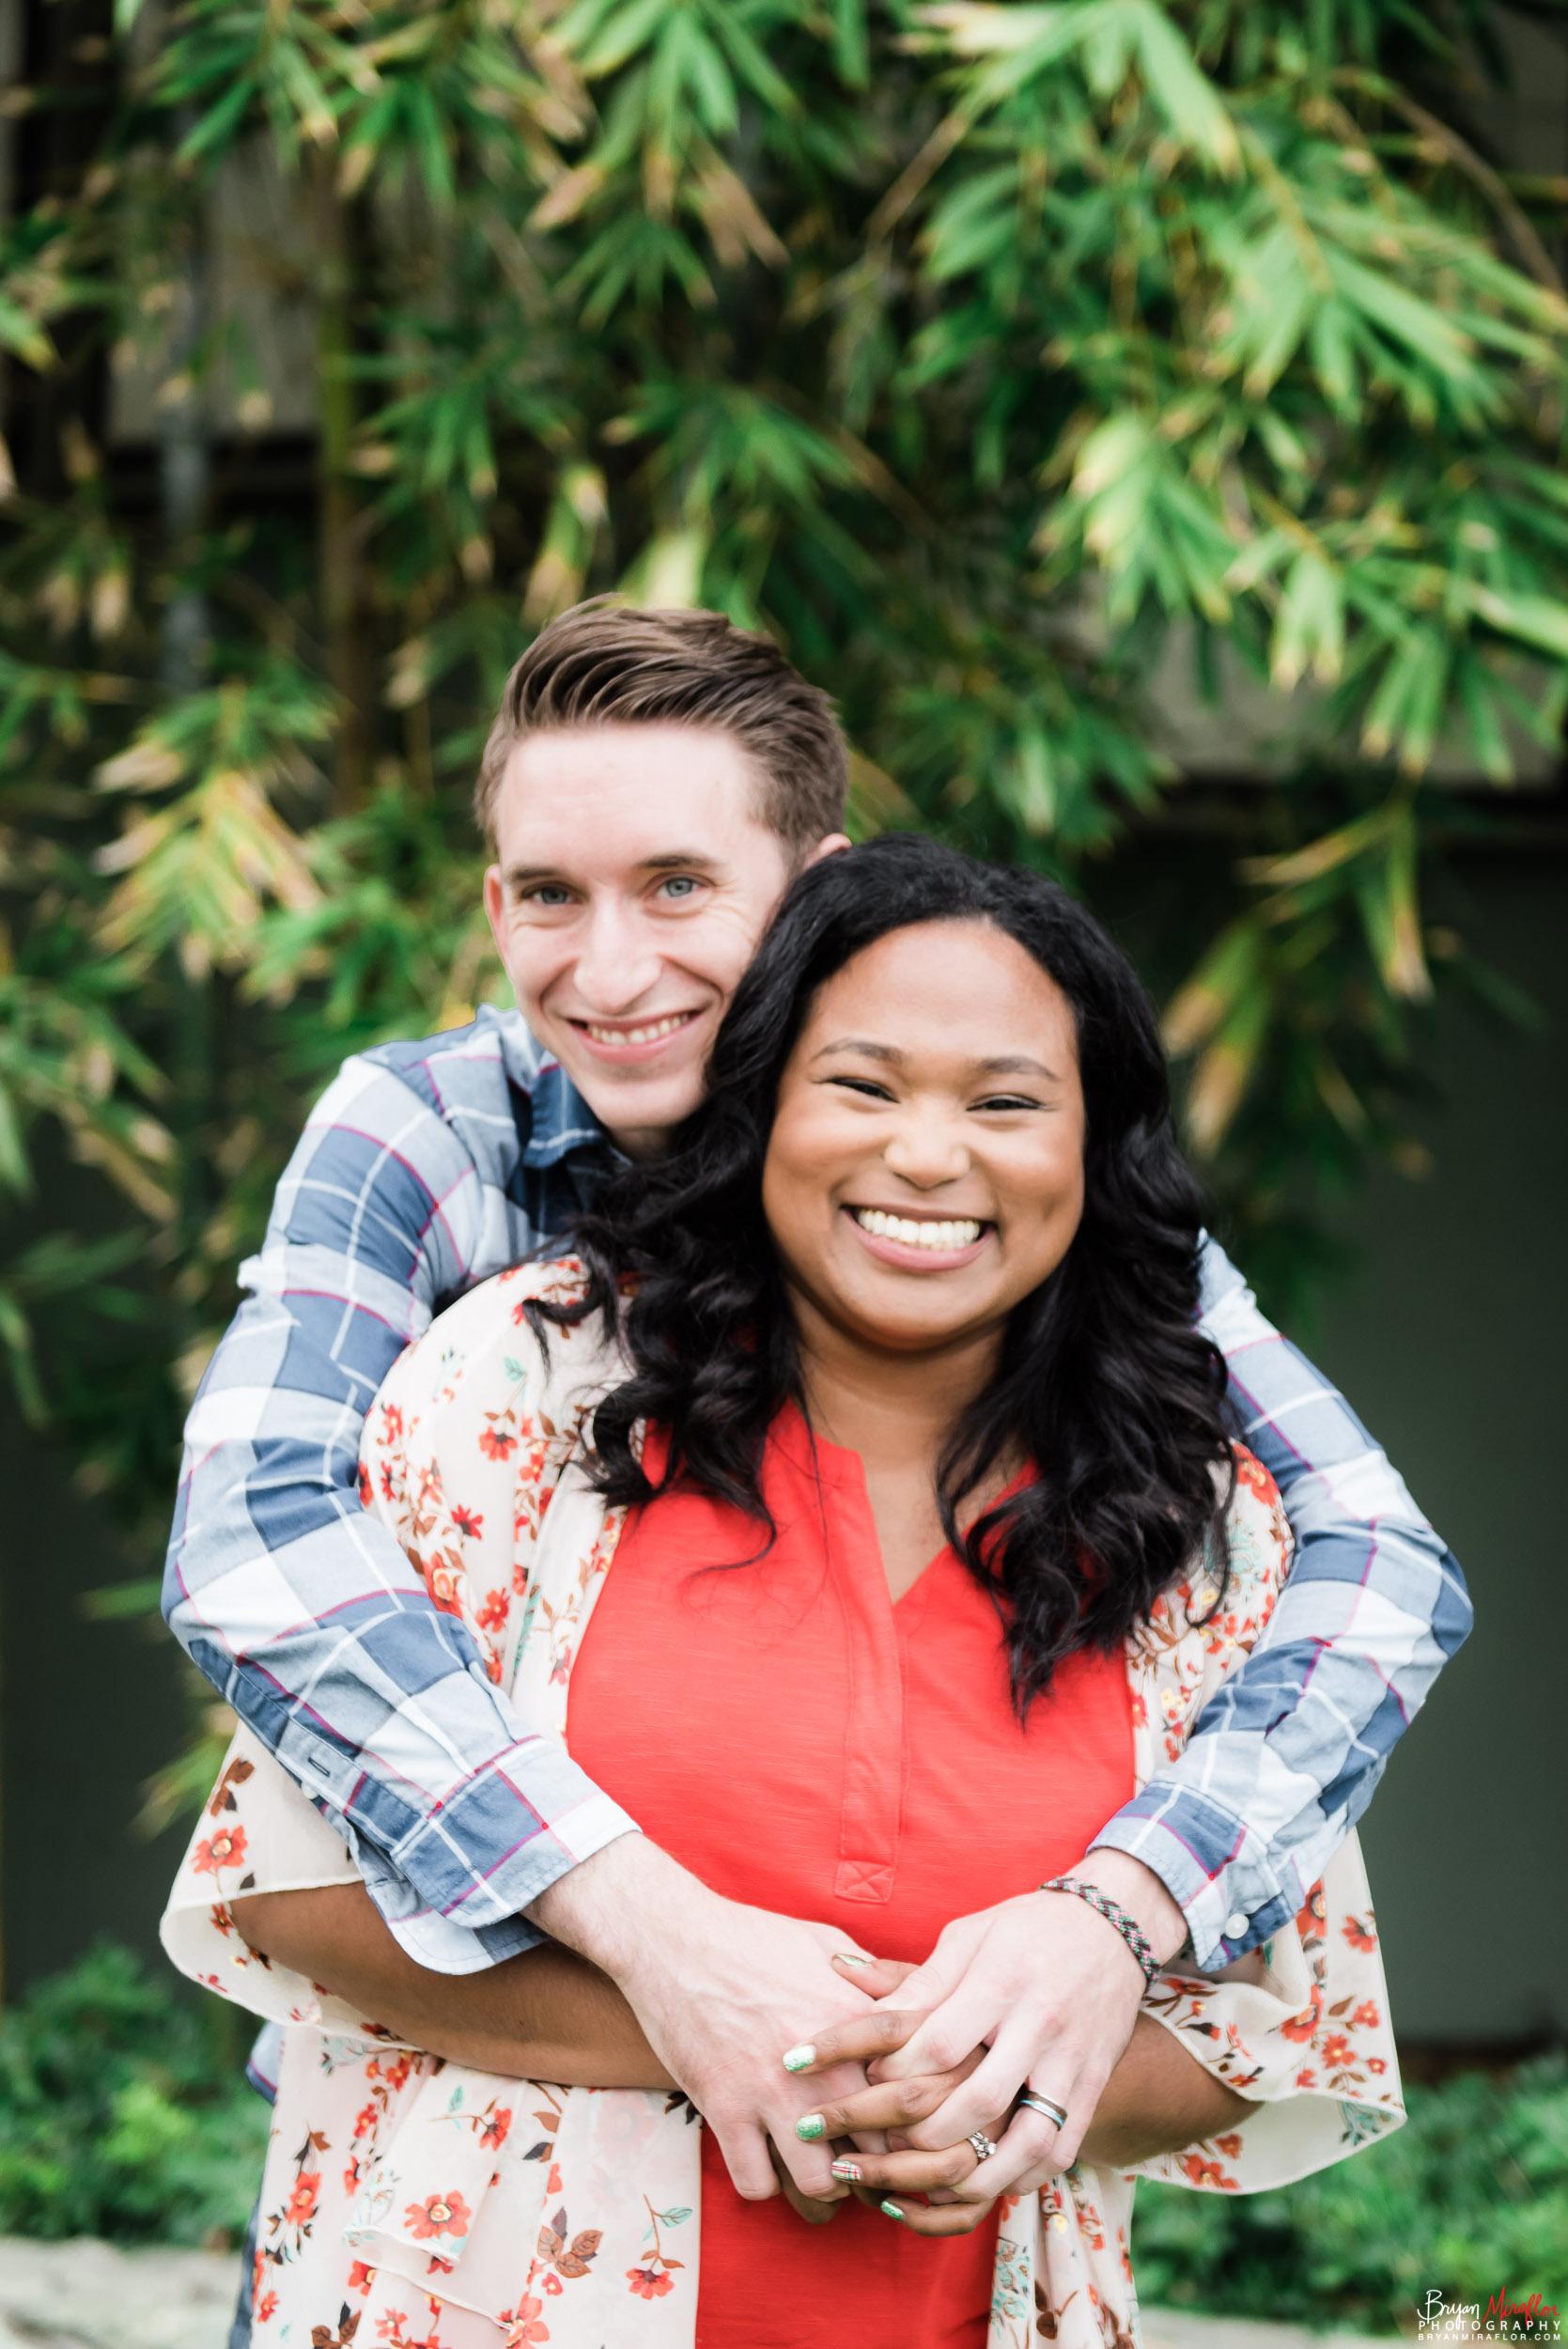 Bryan-Miraflor-Photography-Vanessa-Tommy-LACMA-DTLA-Engagement-Photoshoot-20161210-24.jpg